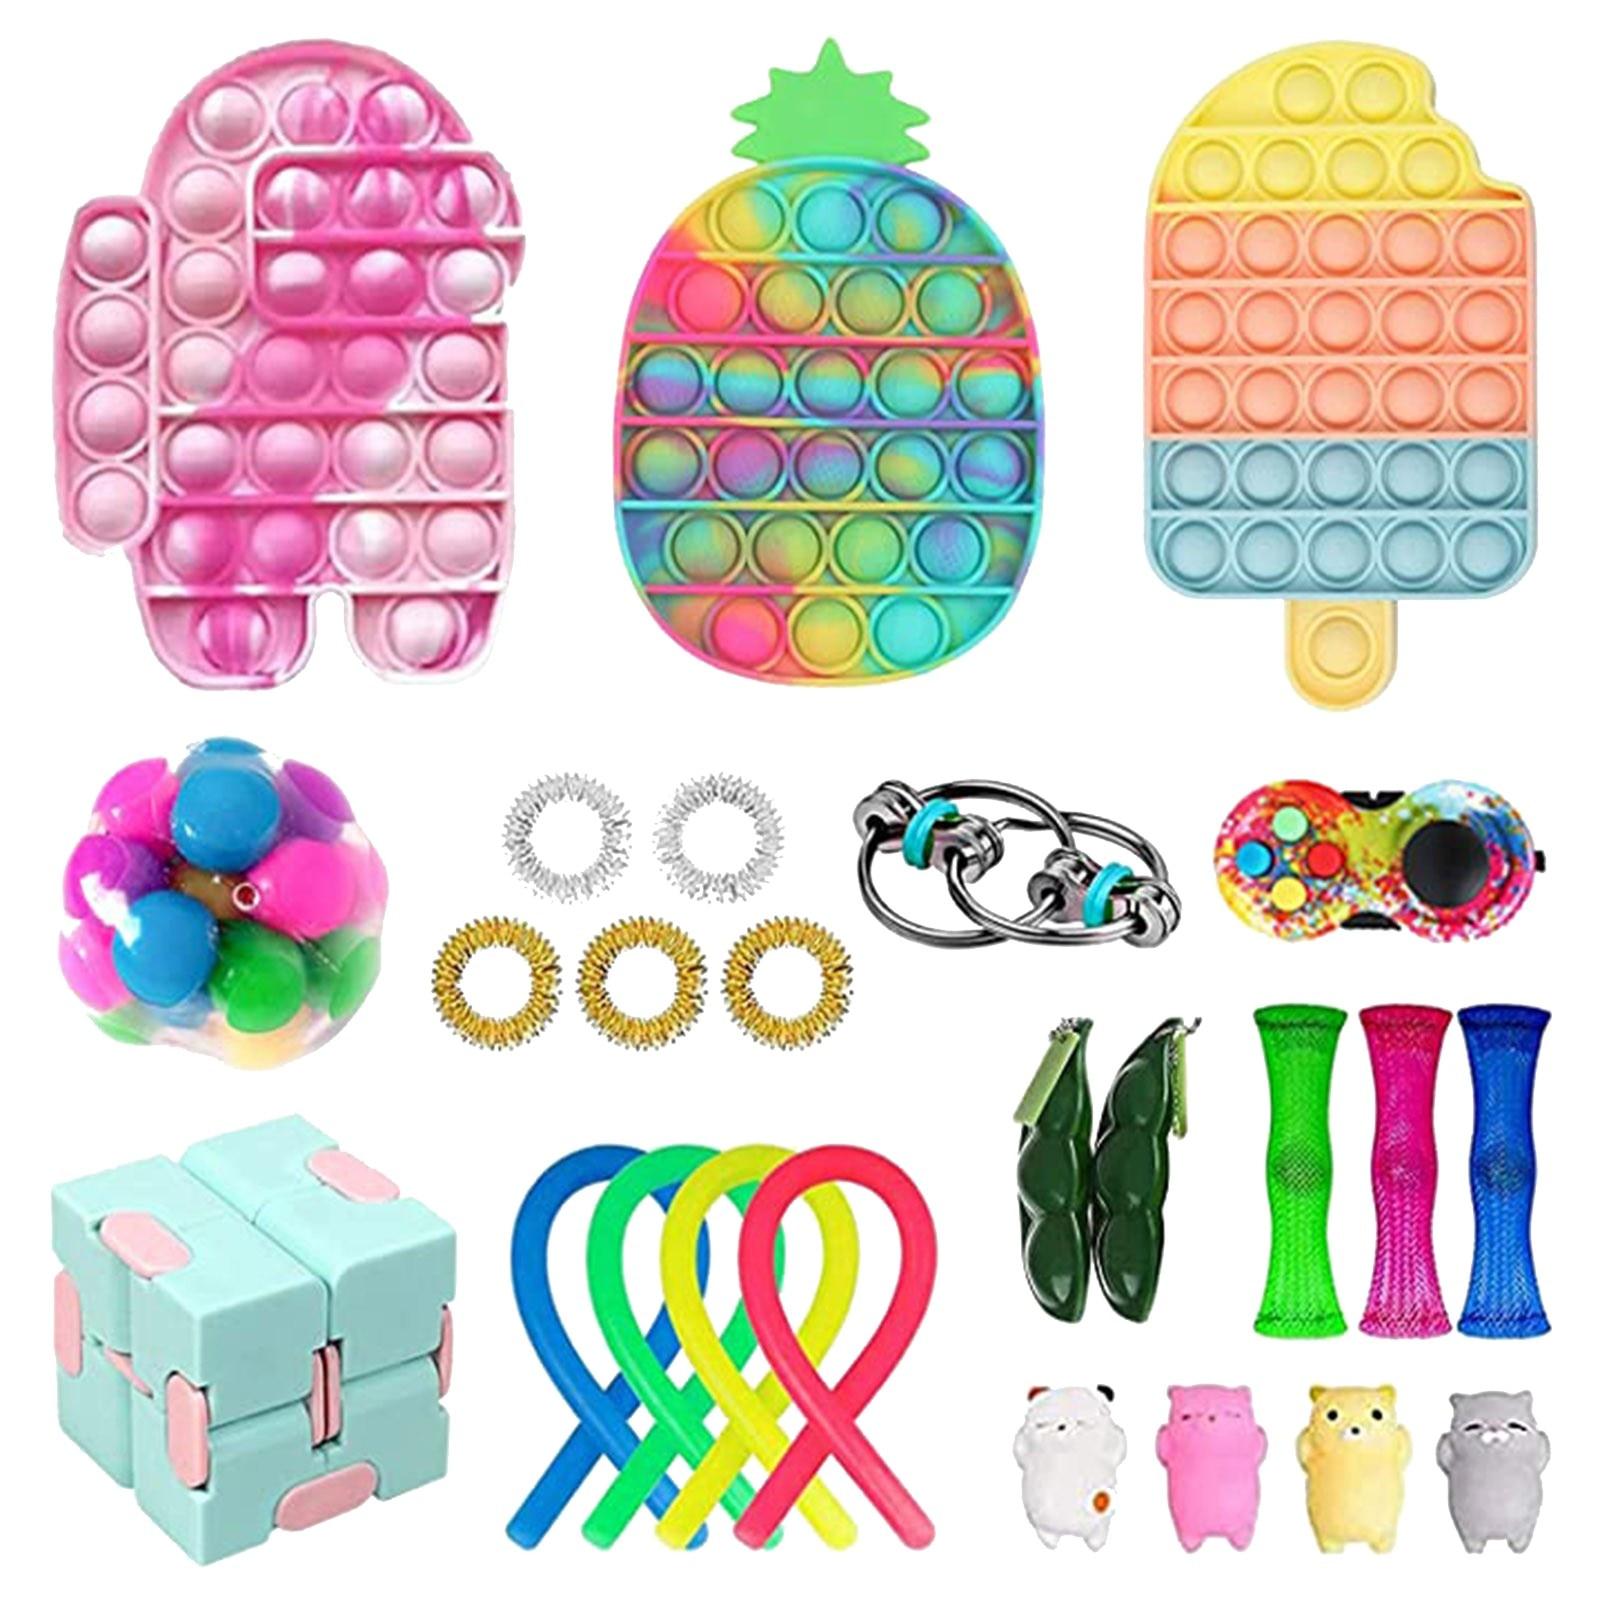 30Pack Fidget Toys Anti Stress Set Stretchy Strings Push Gift Pack Adults Children Squishy Sensory Antistress - Simple Dimple Fidget